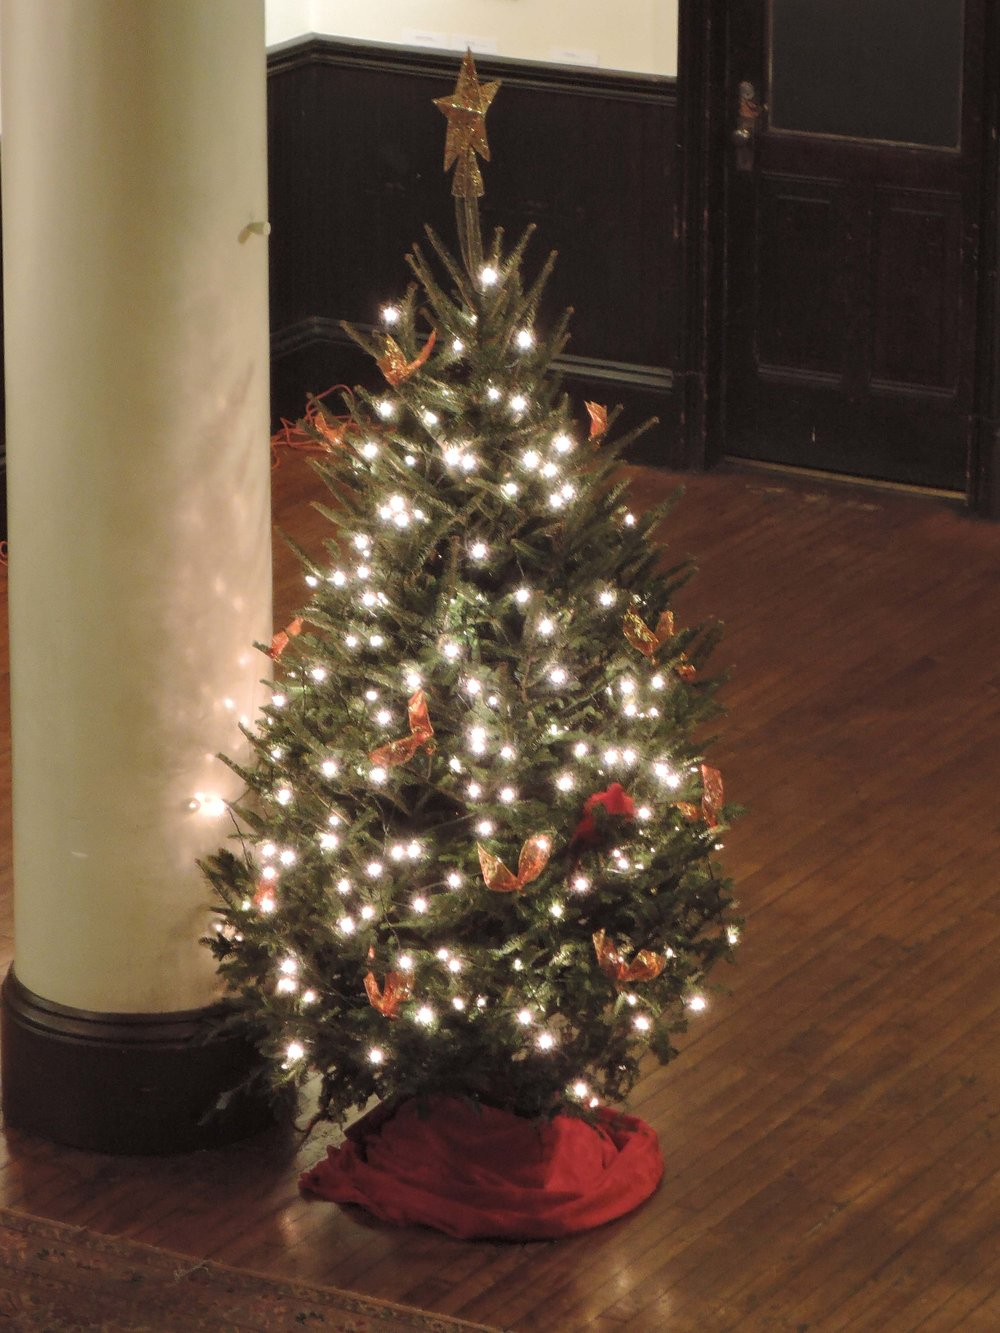 Christmas tree in Saint Joseph's Hall